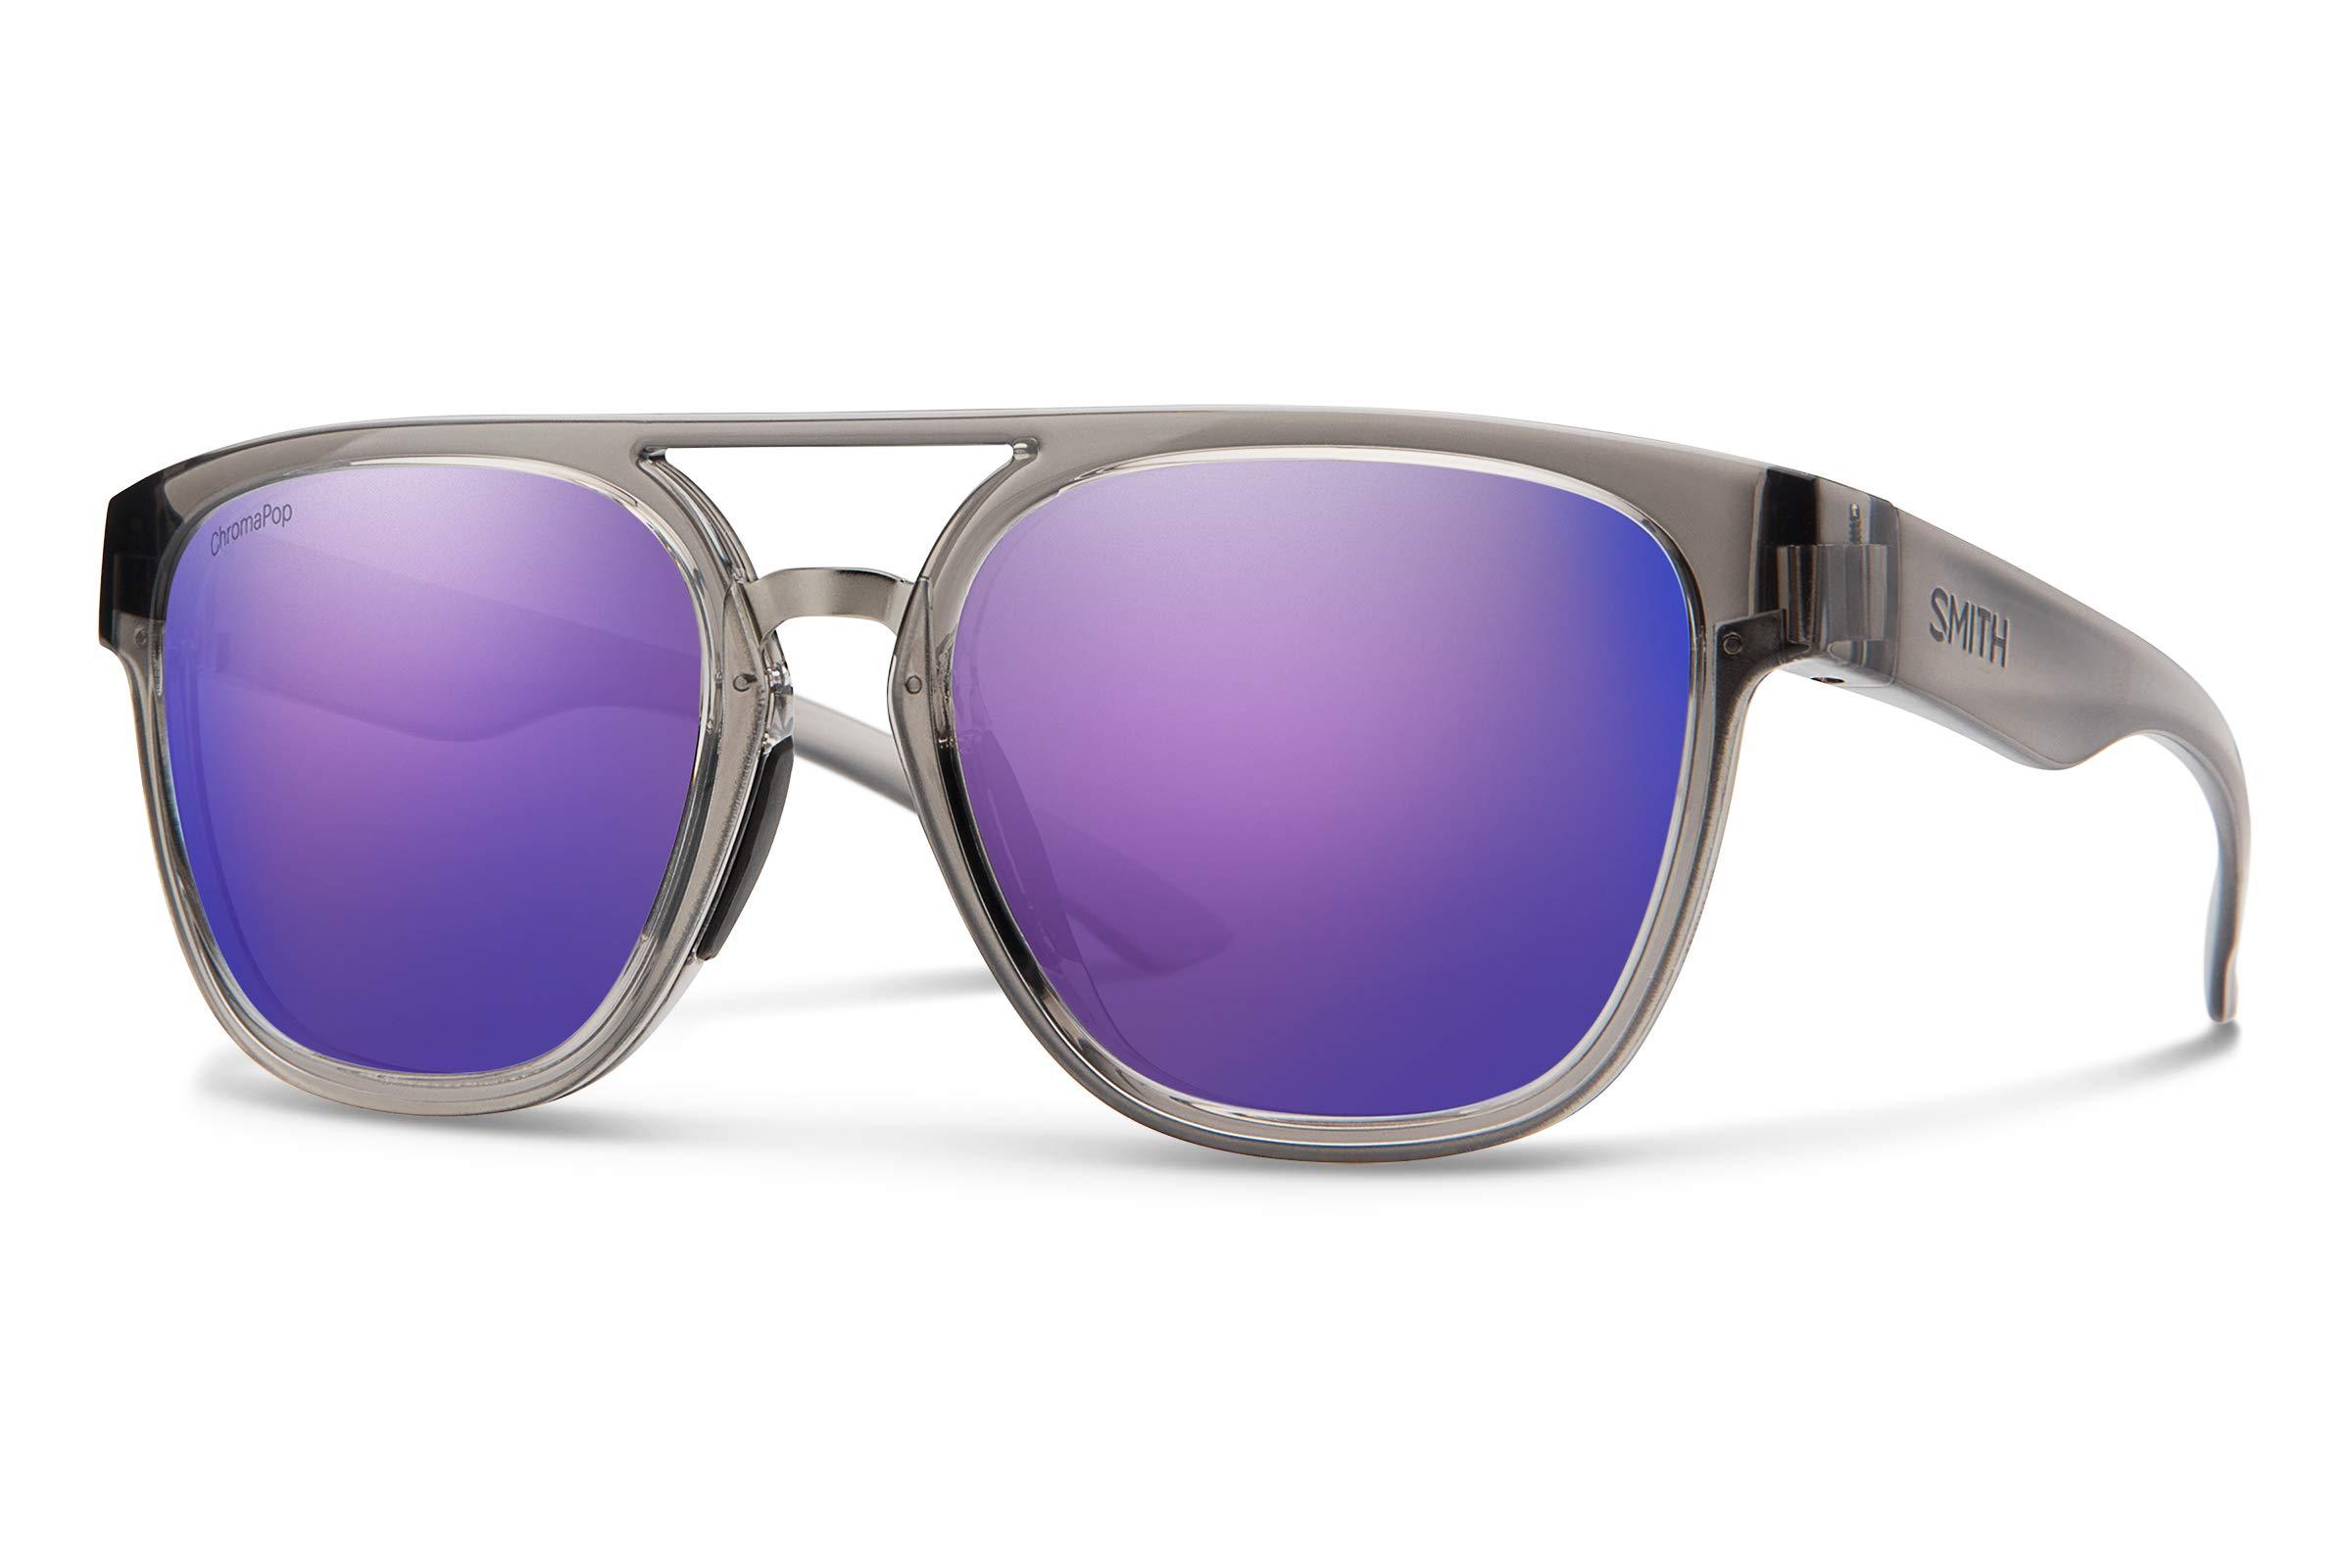 Optics Montures Grey54 スミスオプティクスAgency De Homme Smith LunettesMulticolorecry CxoedB